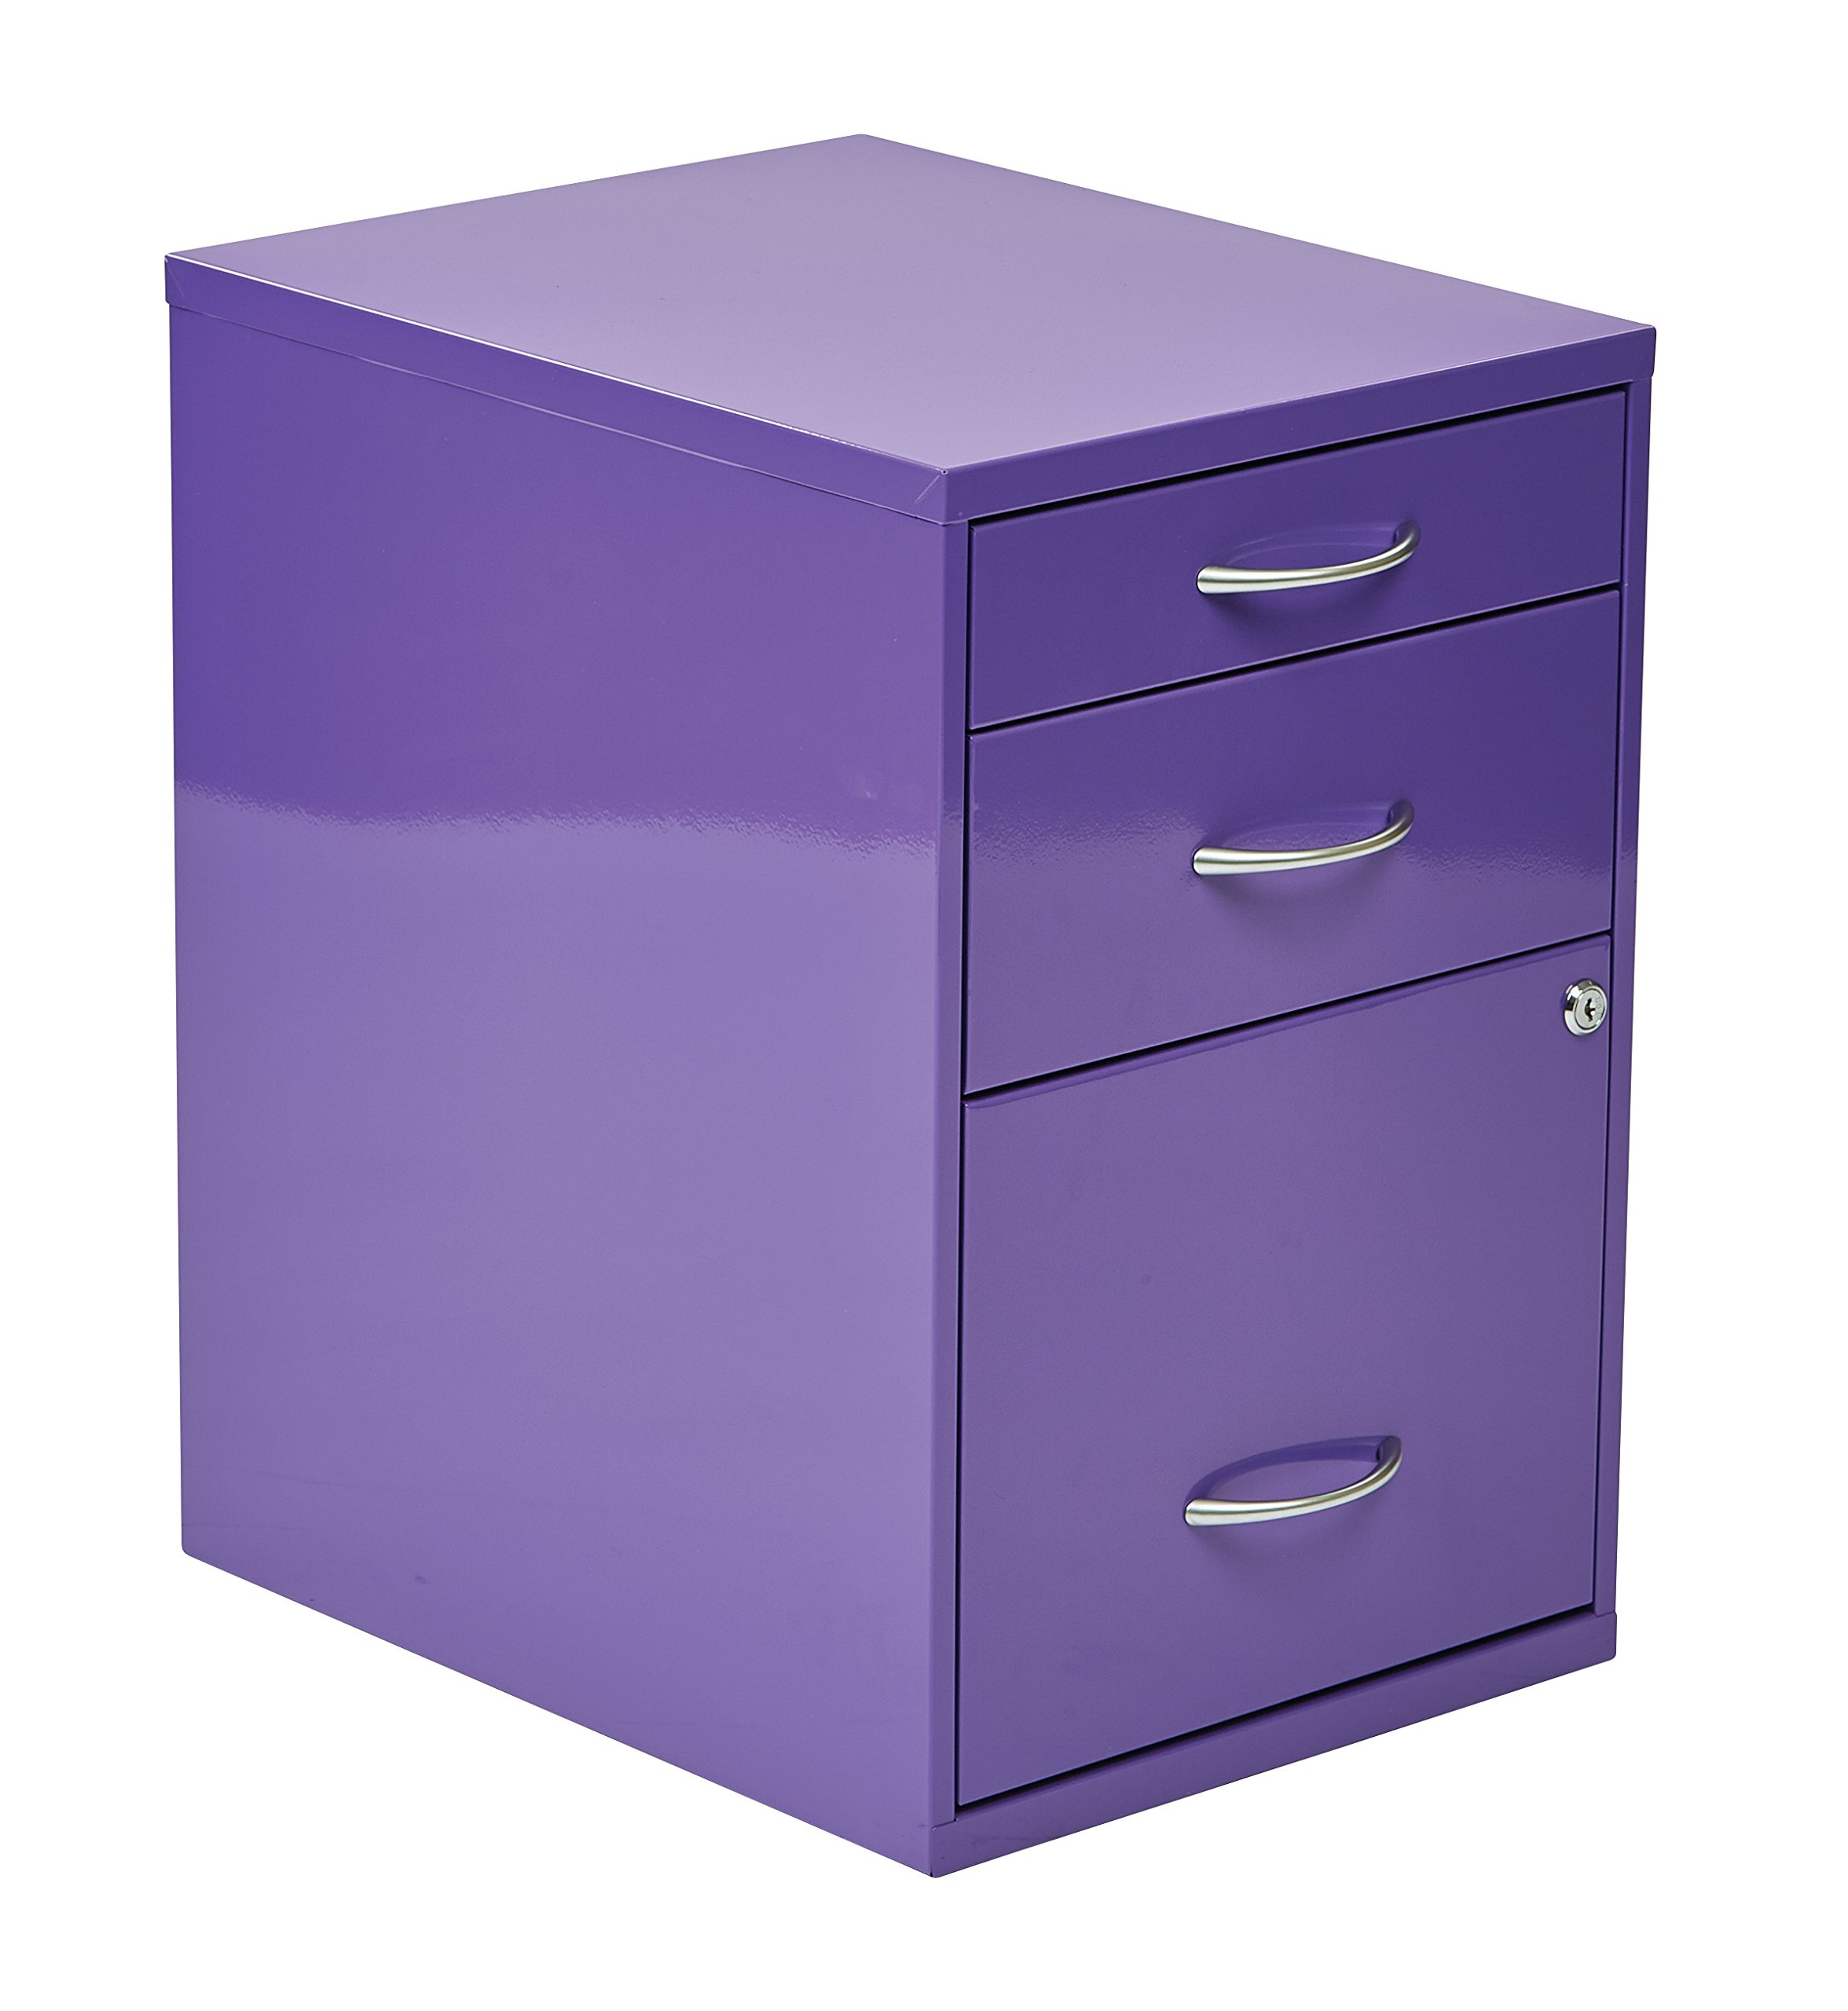 Office Star 3-Drawer Metal File Cabinet, Purple Finish